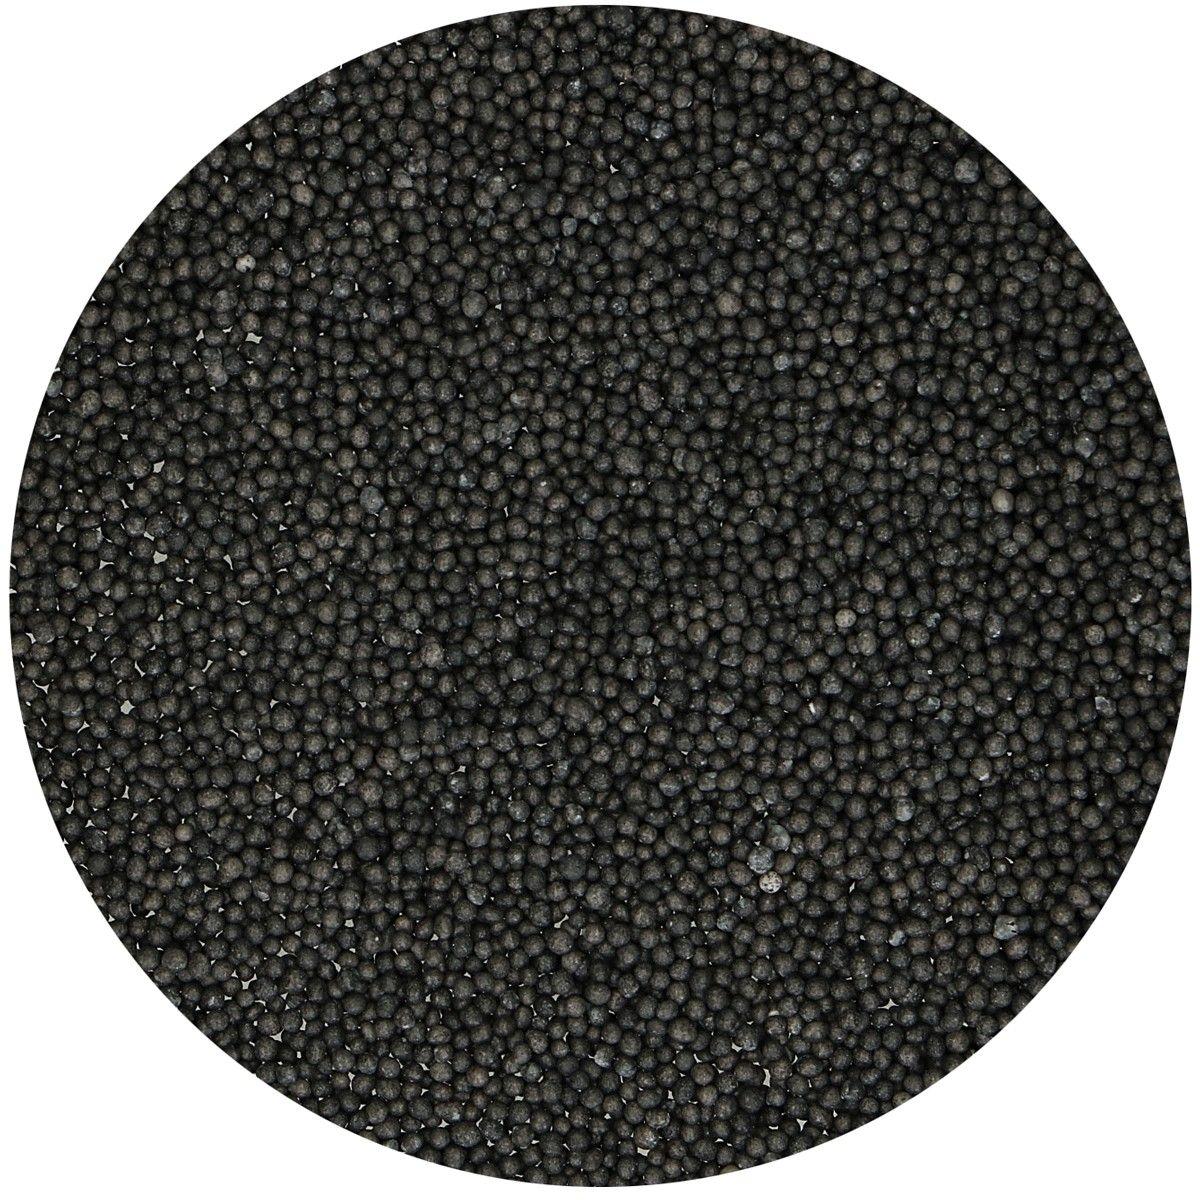 NonPareils - Preto 80gr